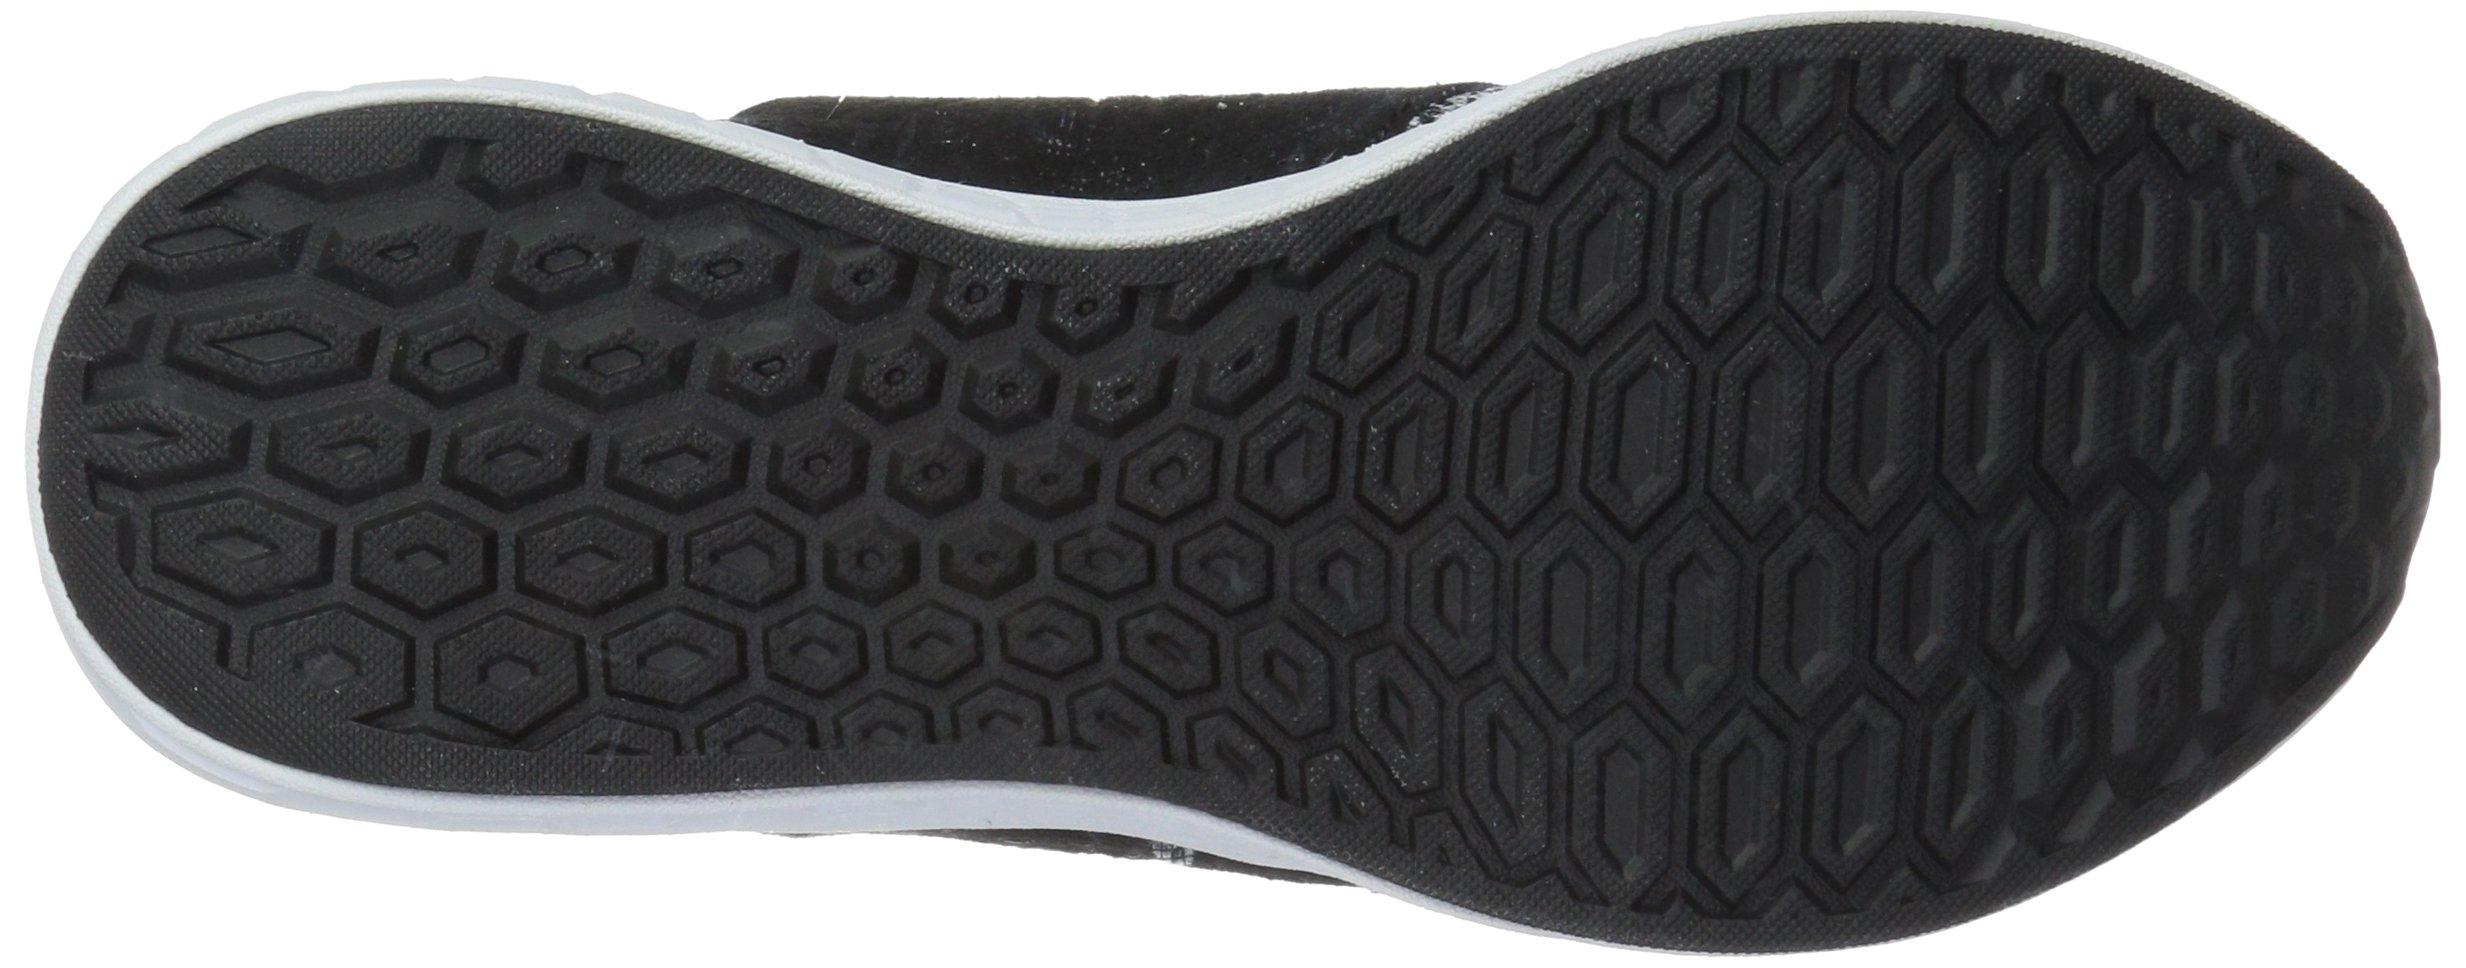 New Balance Men's Cruz V2 Fresh Foam Running Shoe, white/black, 7 D US by New Balance (Image #3)